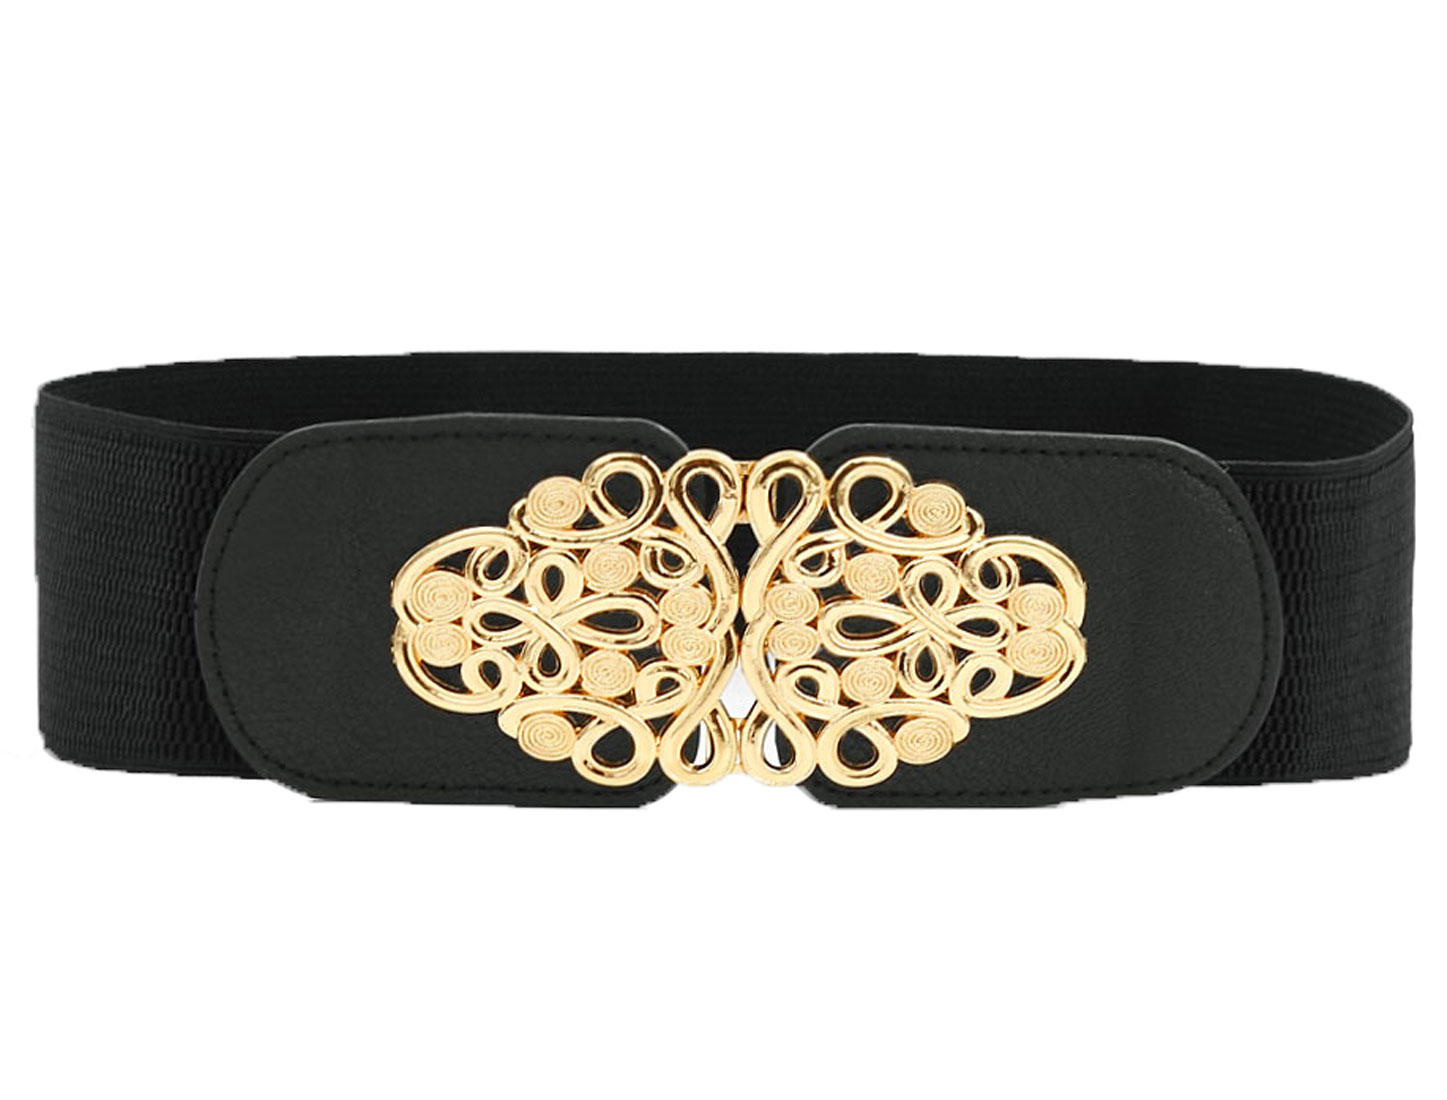 Women Interlocking Buckle Chinese Knotting Waist Belt Black